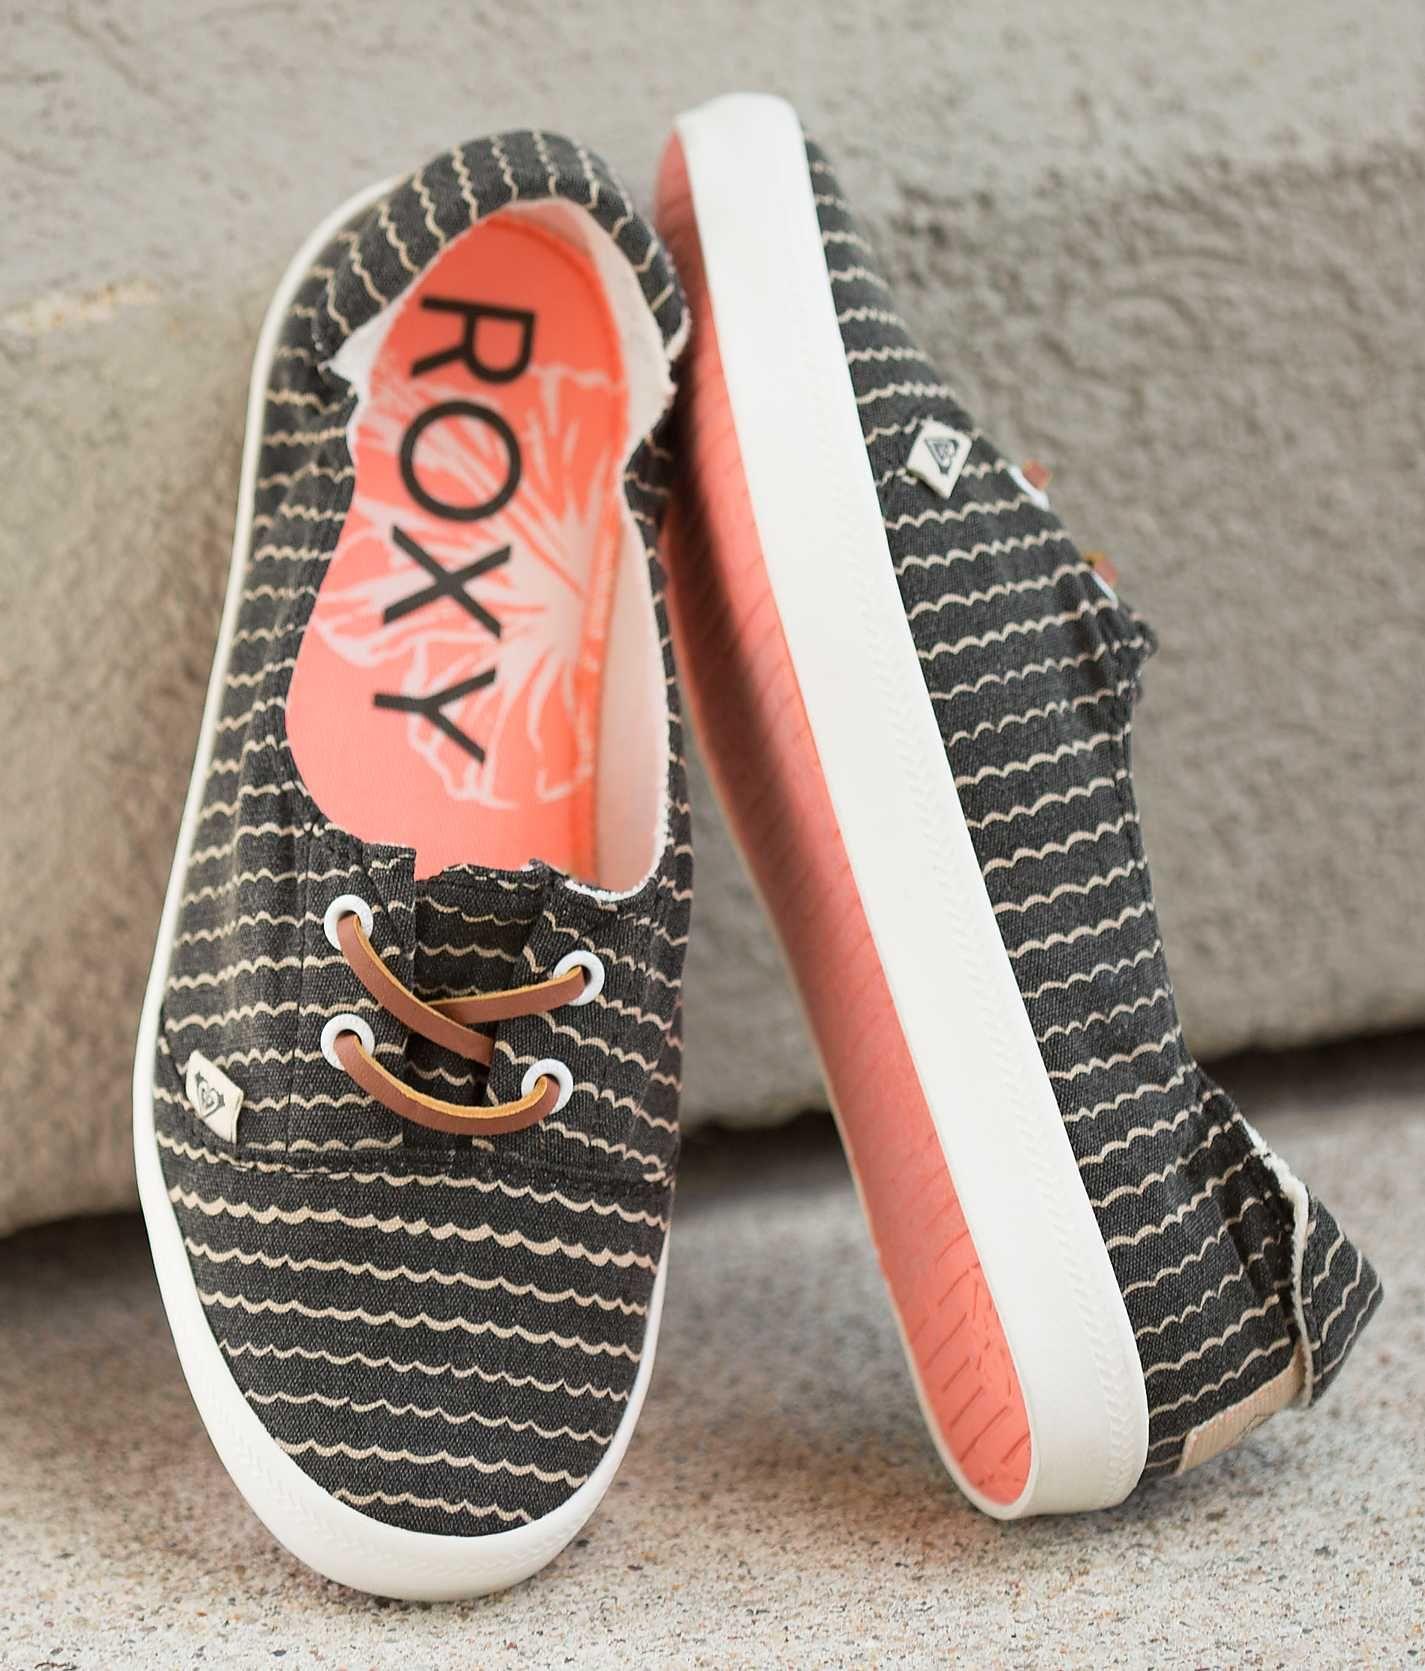 Roxy Kayak Shoe | Roxy shoes, Shoes